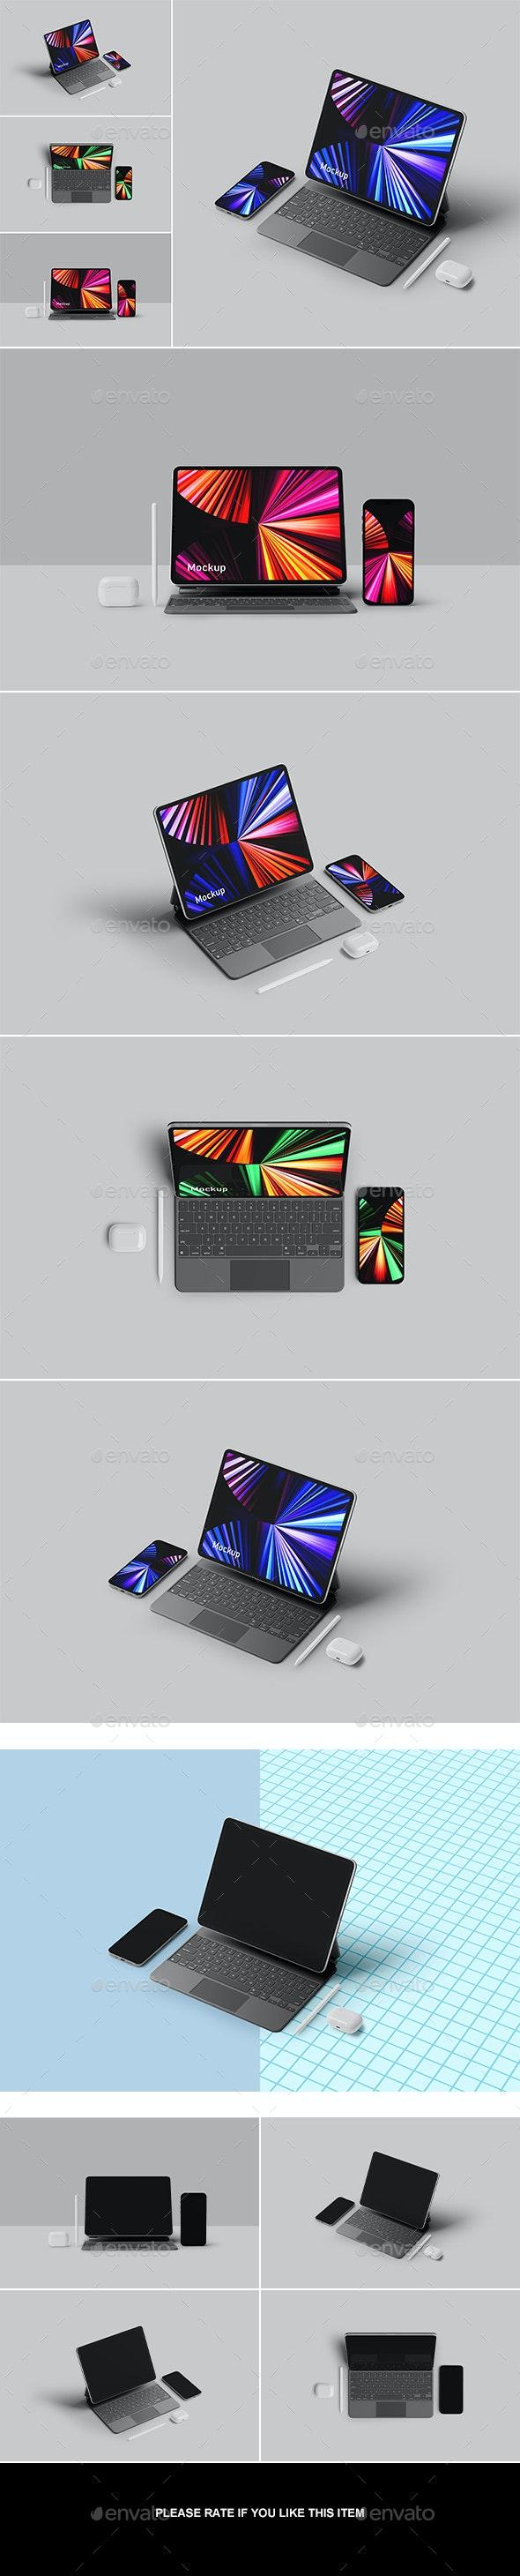 Pad Pro with Phone 12 Pro Mockup - Displays Product Mock-Ups